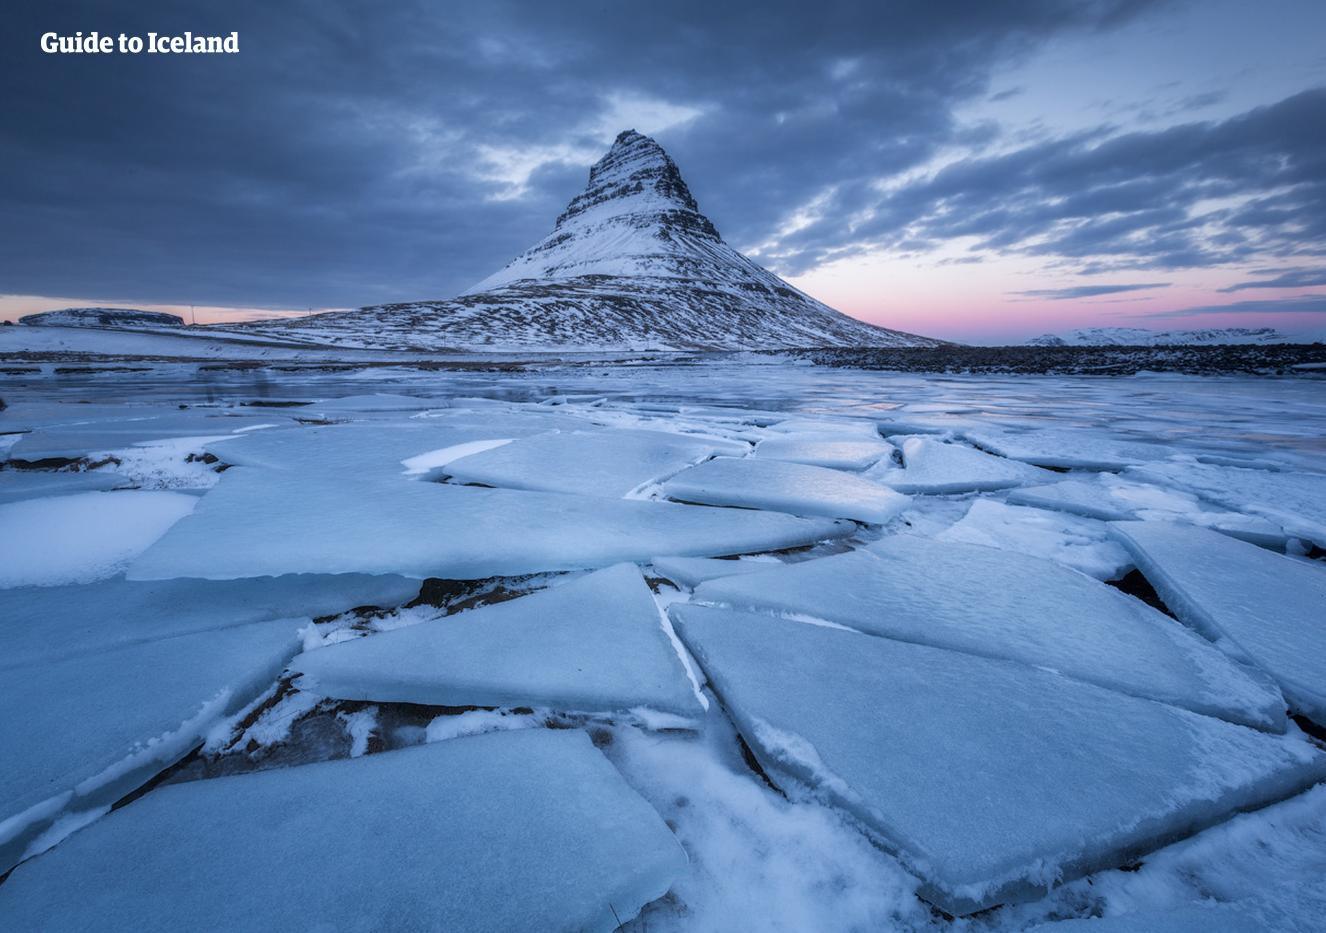 Der Berg Kirkjufell steht trotzig über der Gemeinde Grundarfjörður.